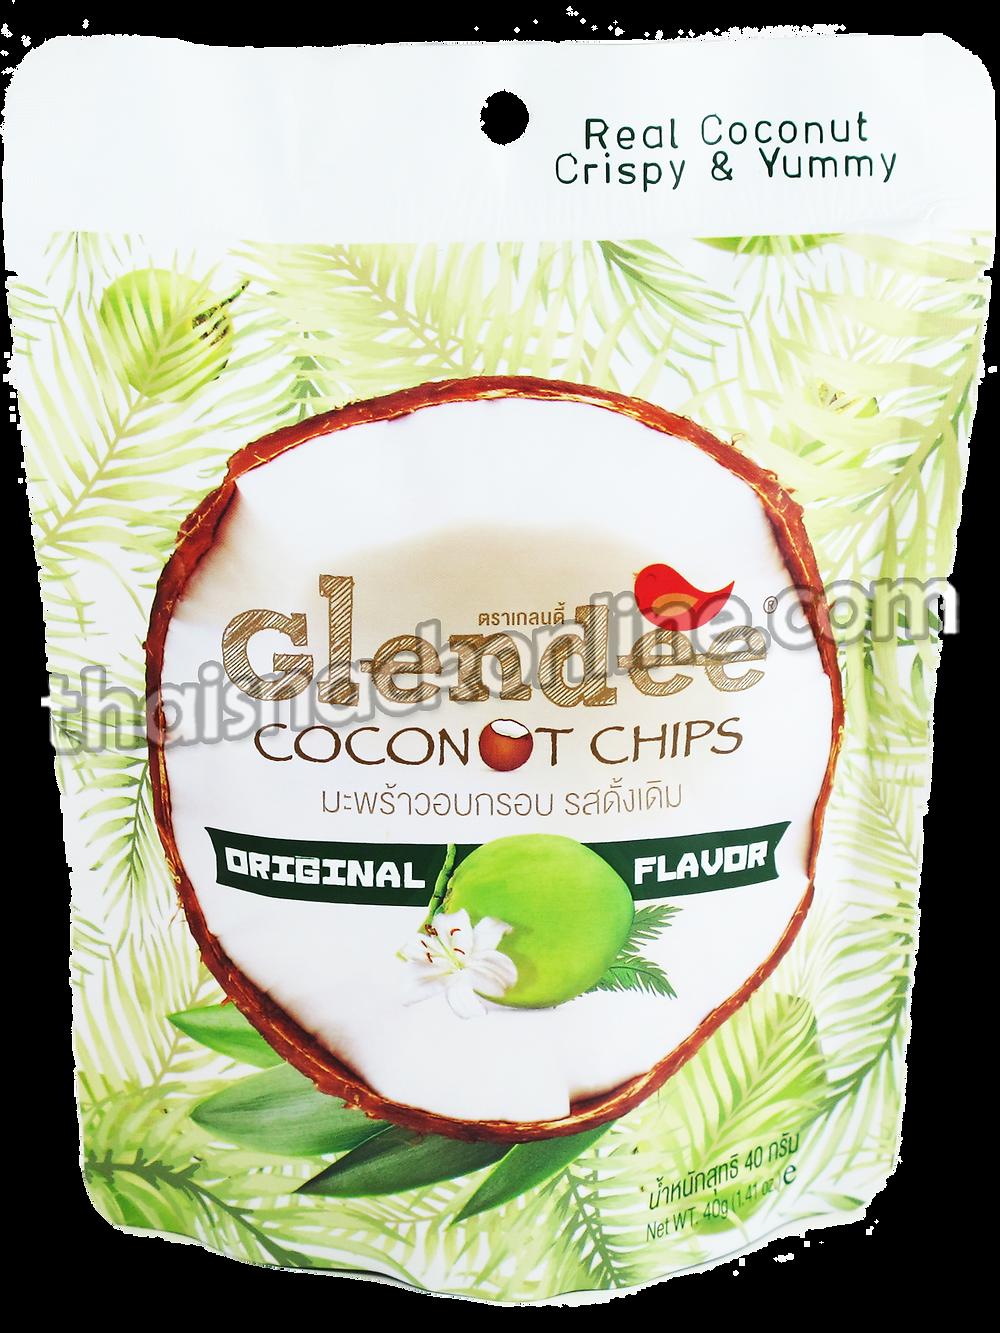 Glendee - Coconut Chips Original